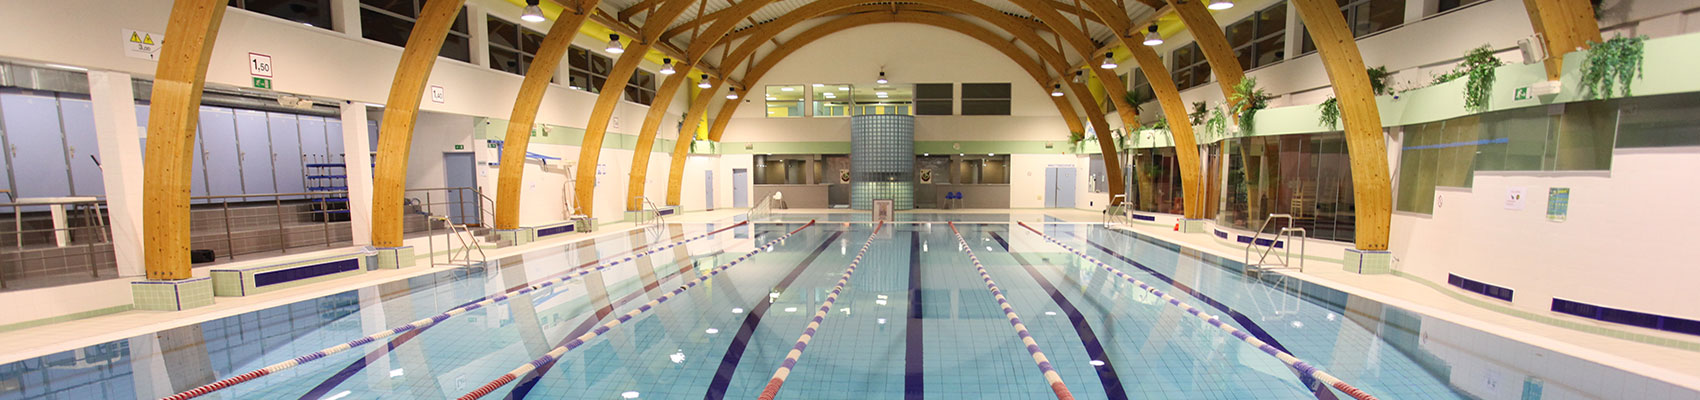 piscine2-1700